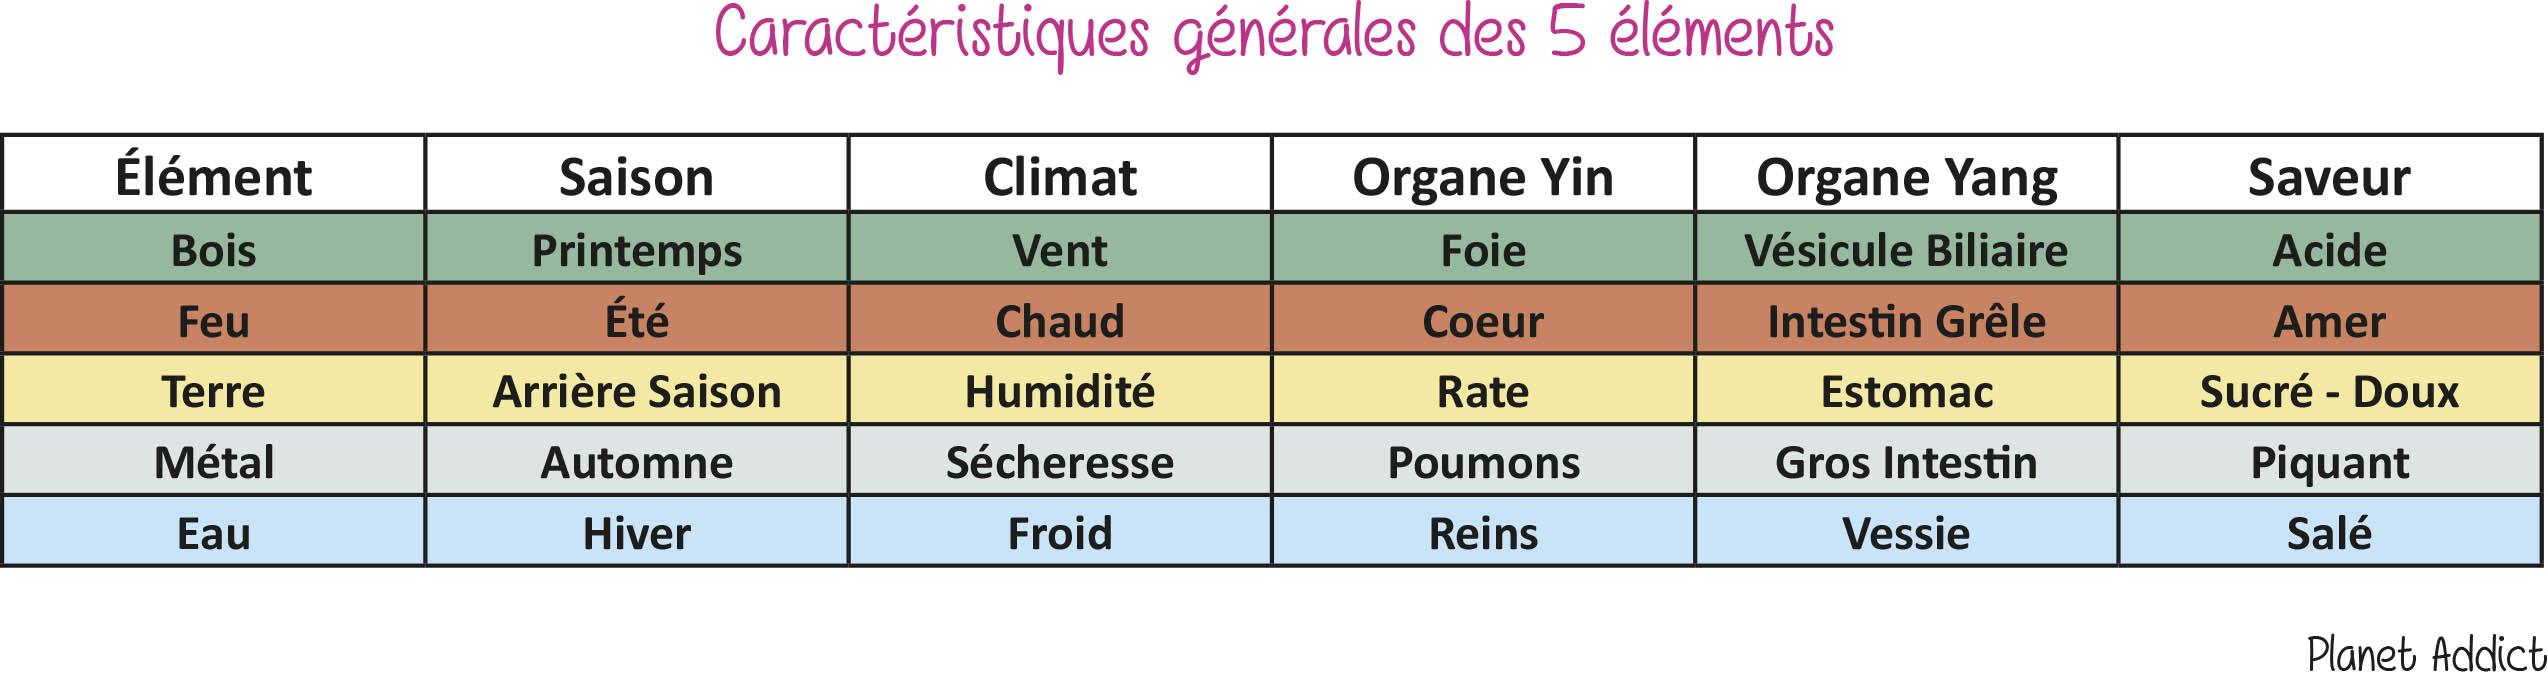 5 éléments - L'alimentation selon les 5 éléments